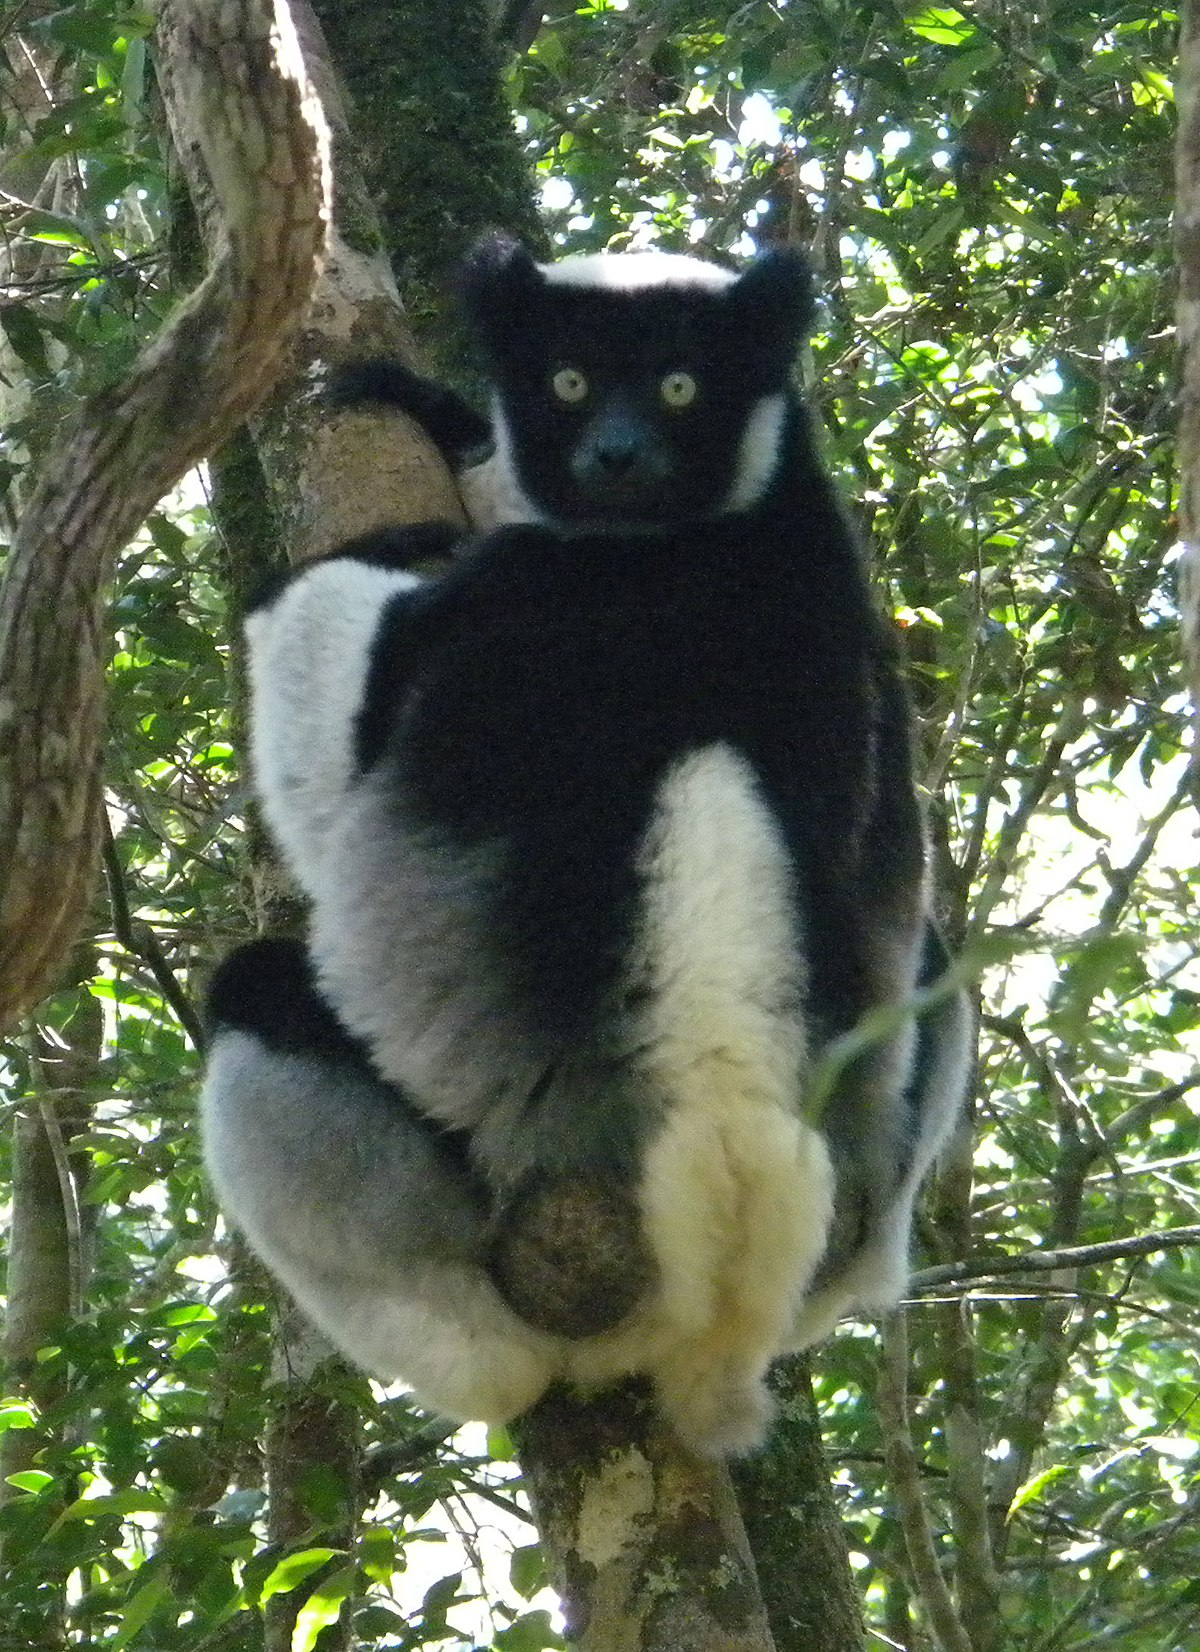 primates observation spider monkey and sifaka essay